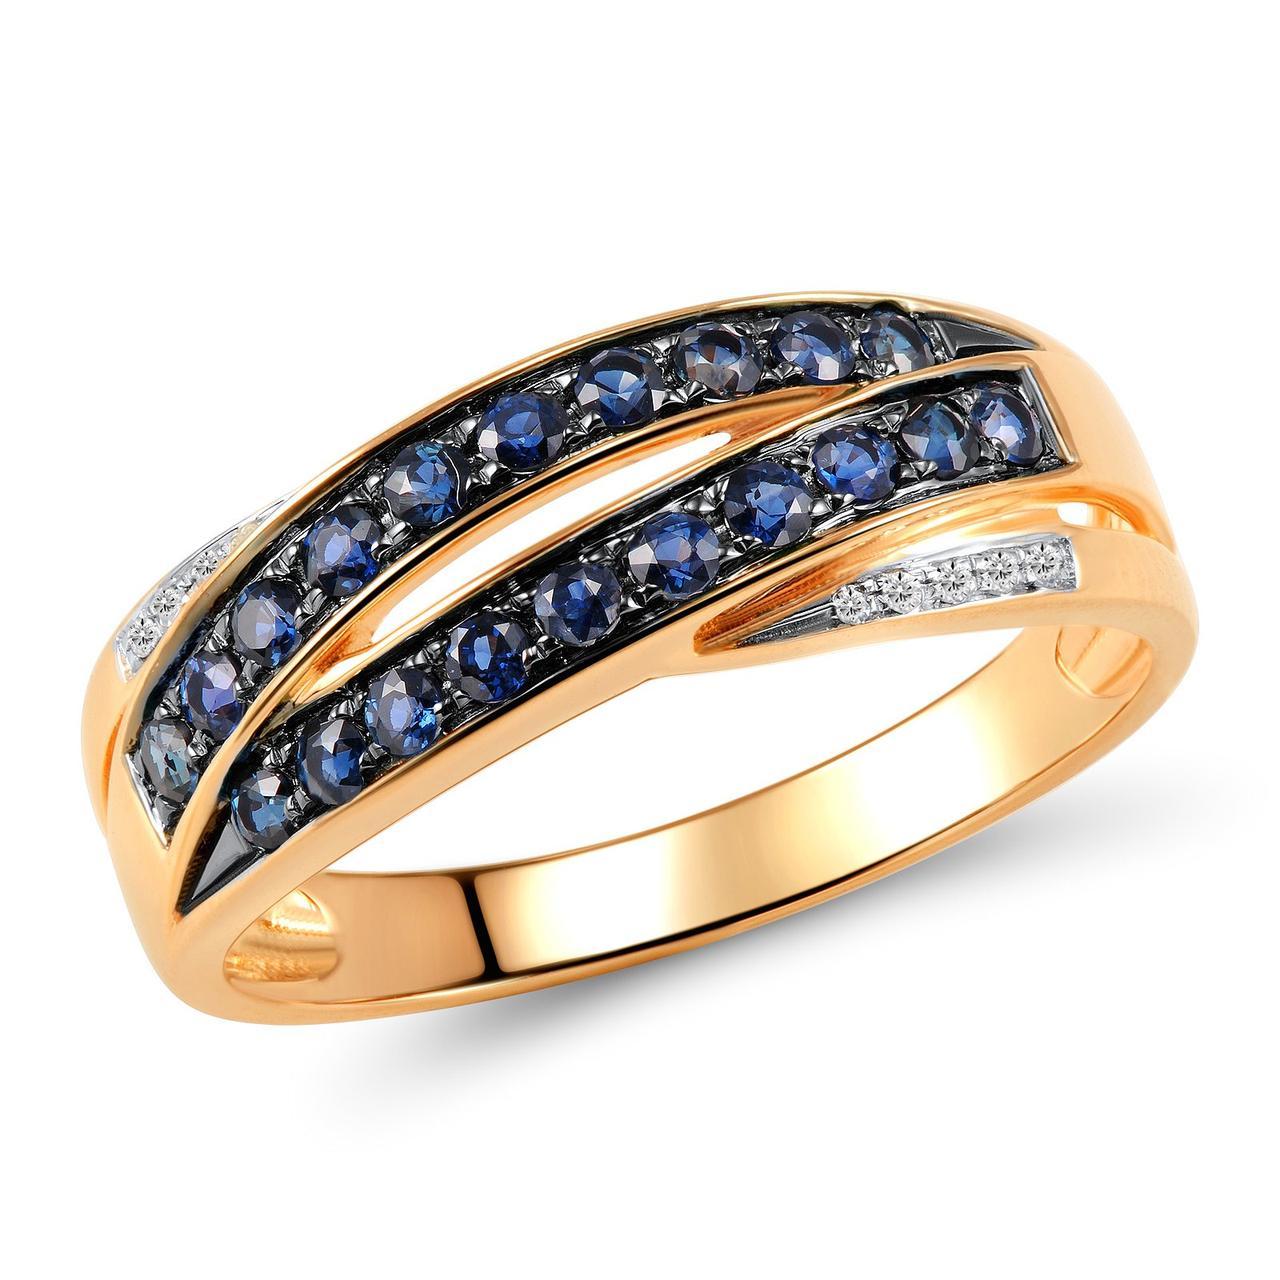 Золотое кольцо с бриллиантами и сапфирами, размер 15 (1551708)